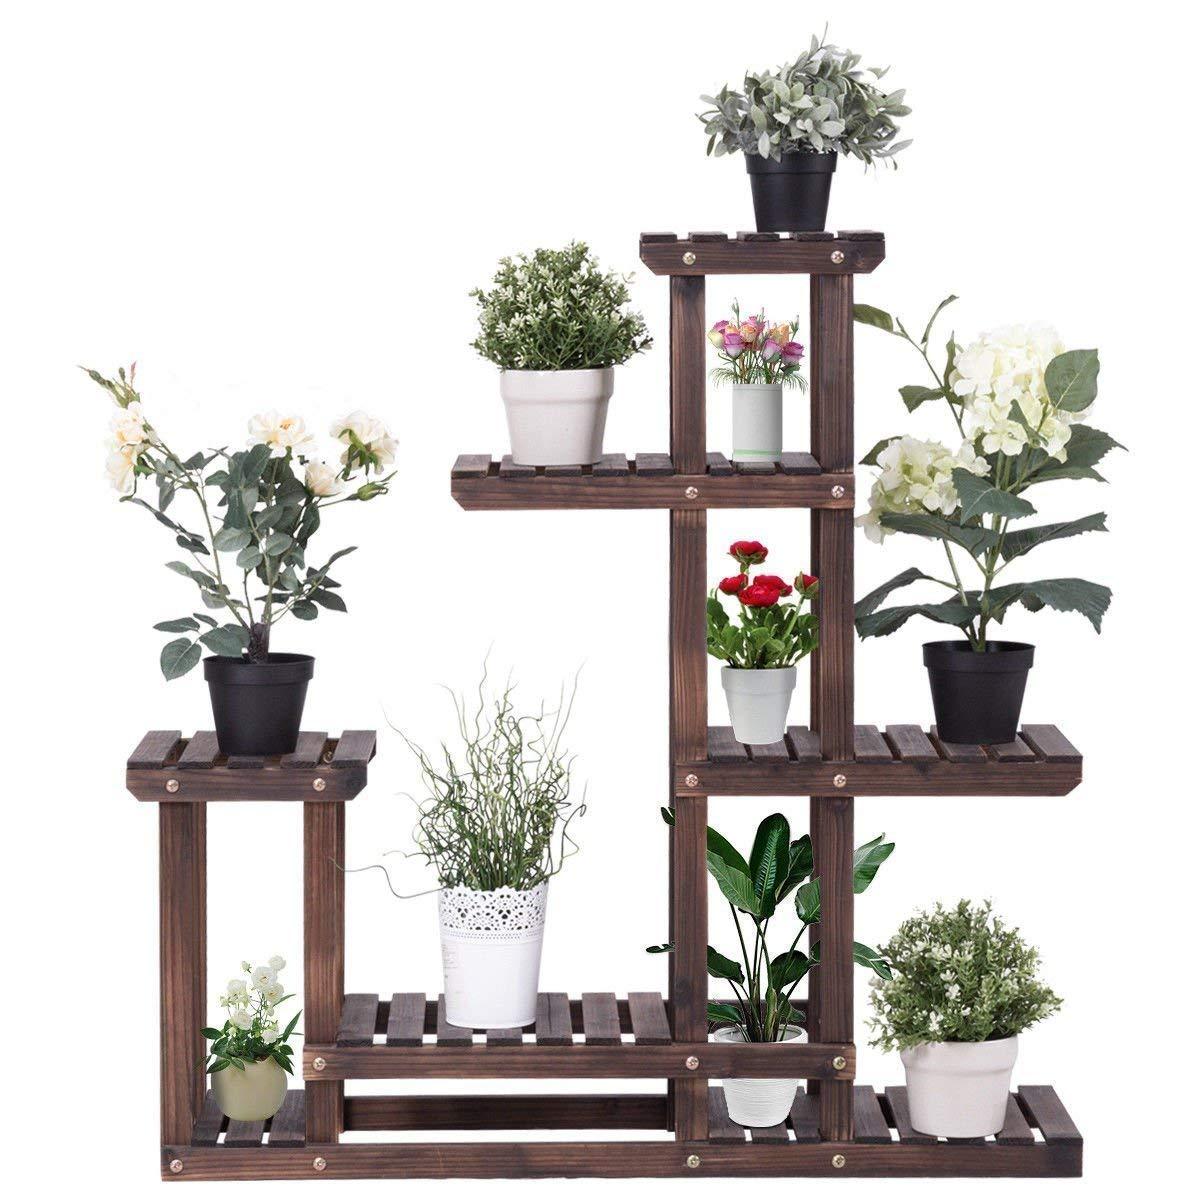 Giantex Flower Rack Plant Stand Multi Wood Shelves Bonsai Display Shelf Indoor Outdoor Yard Garden Patio Balcony Multifunctional Storage Rack Bookshelf W/Hollow-Out Rack (6 Wood Shelves 10 Pots)